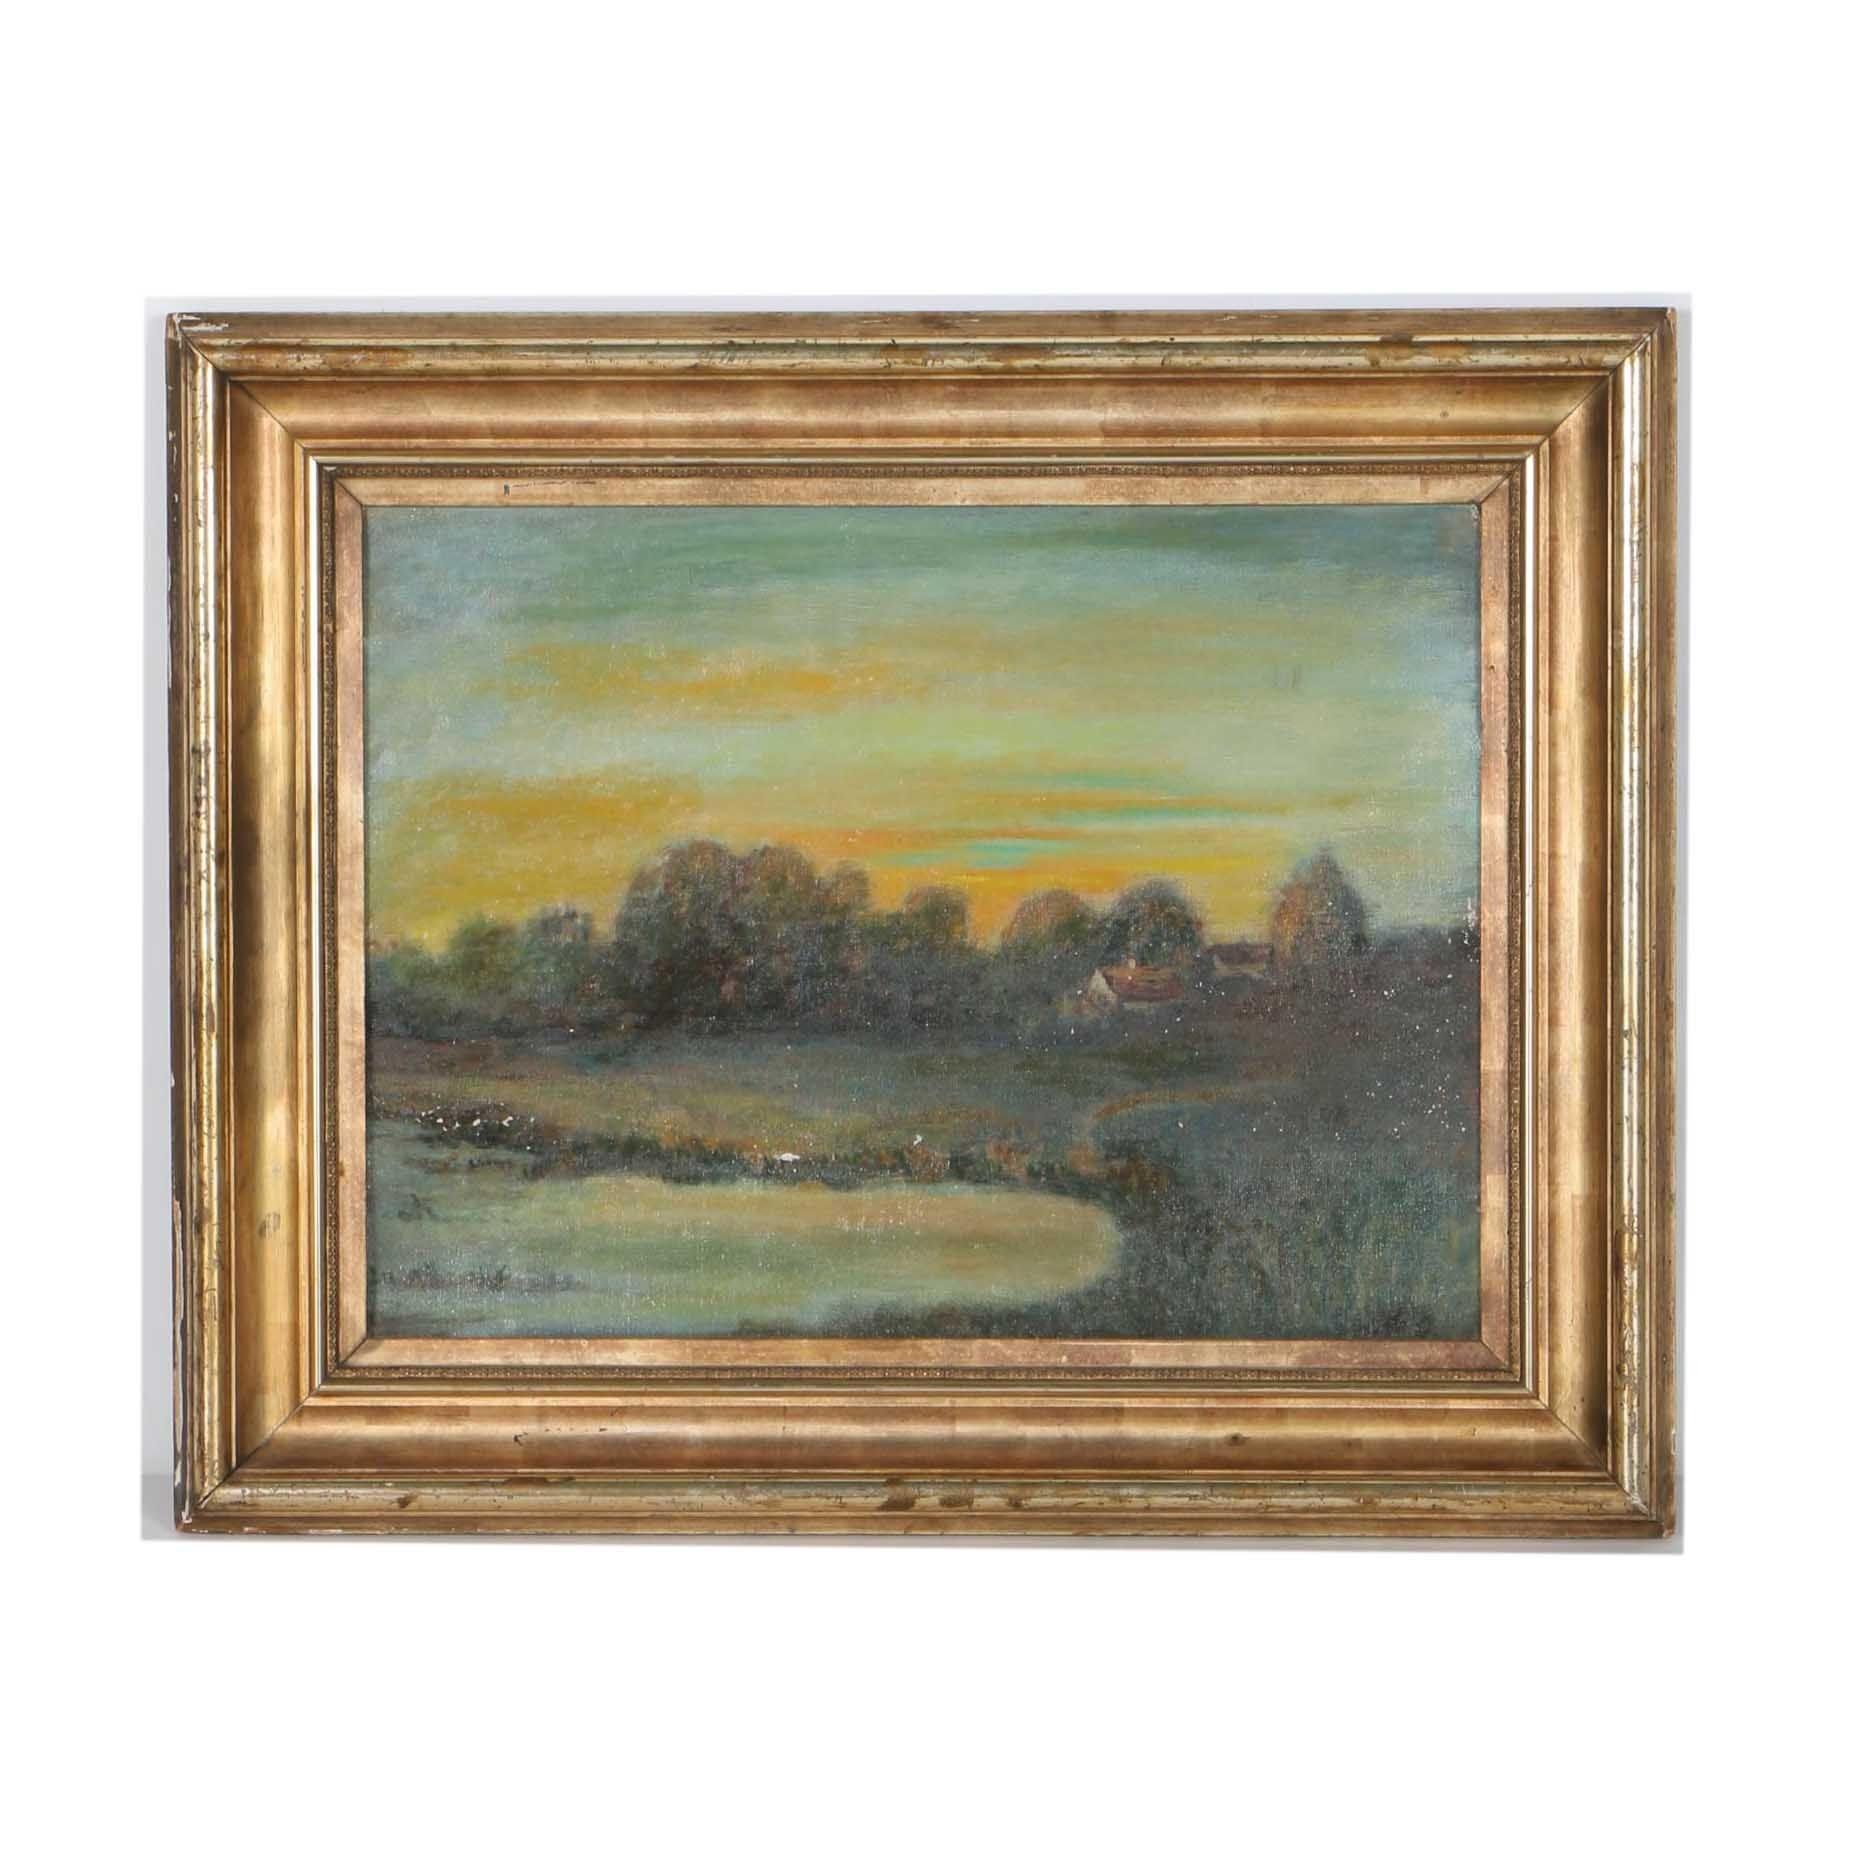 Original Oil on Canvas Board Landscape